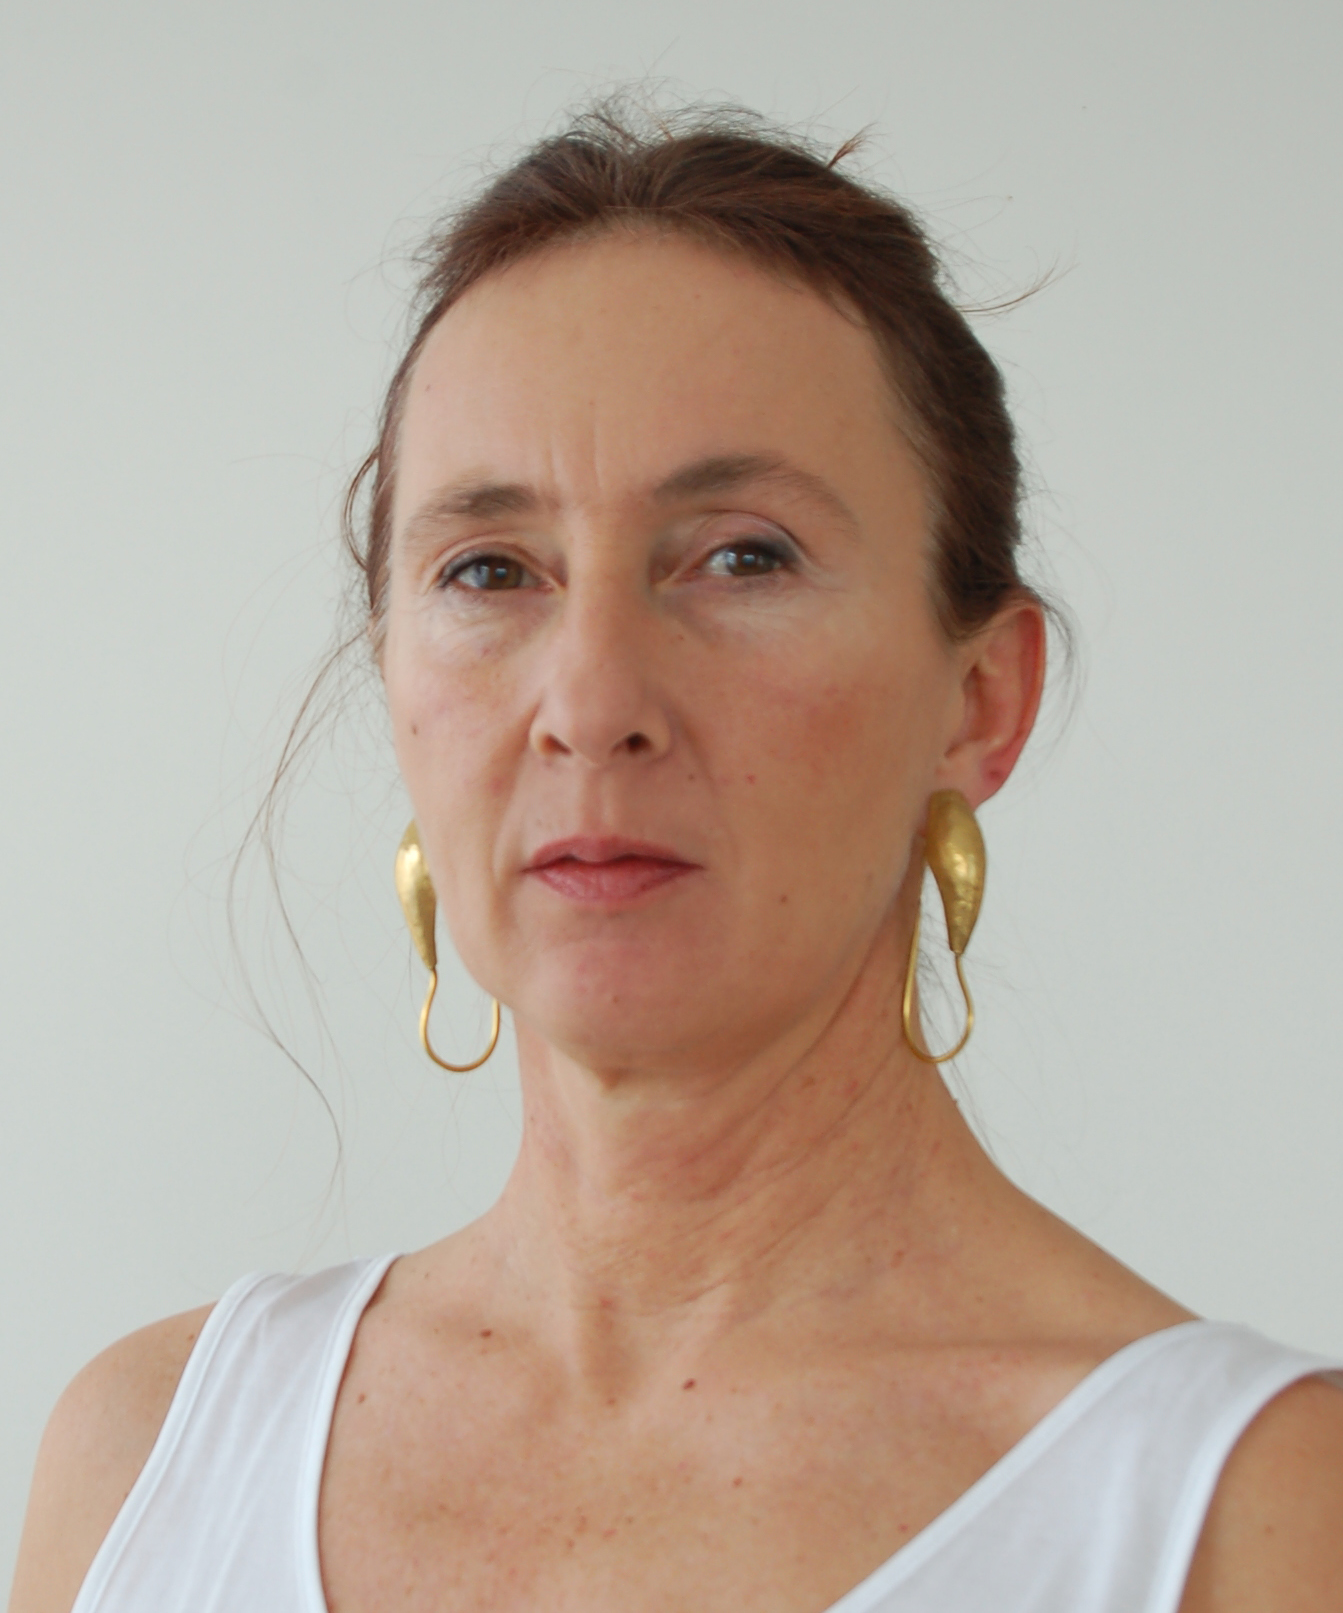 Isolde Frepoli, Selbstportrait